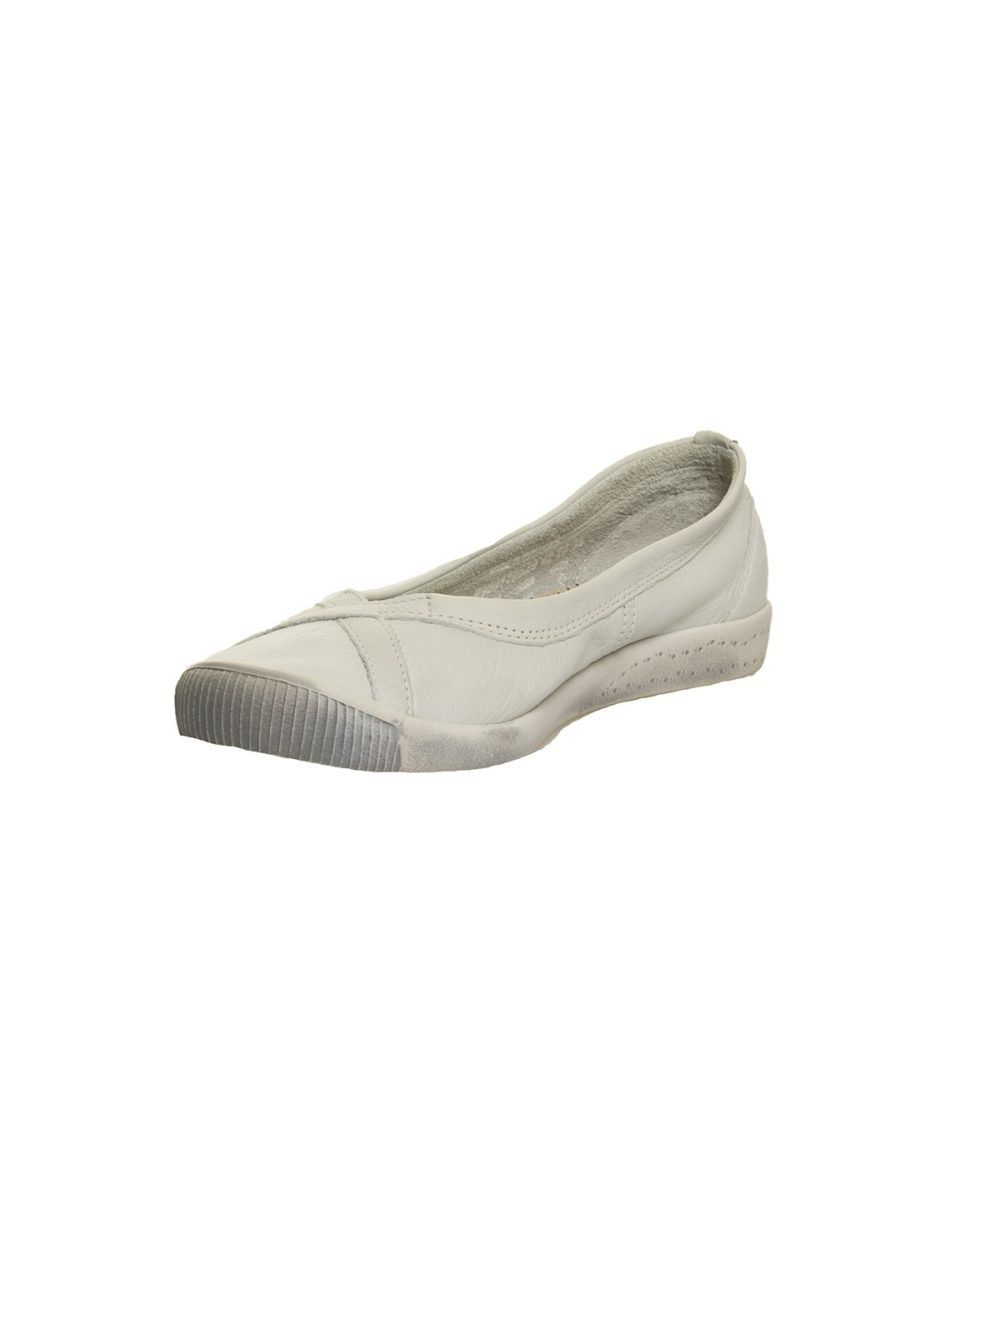 Ilma Shoe Softinos Katie Kerr Women's Clothing